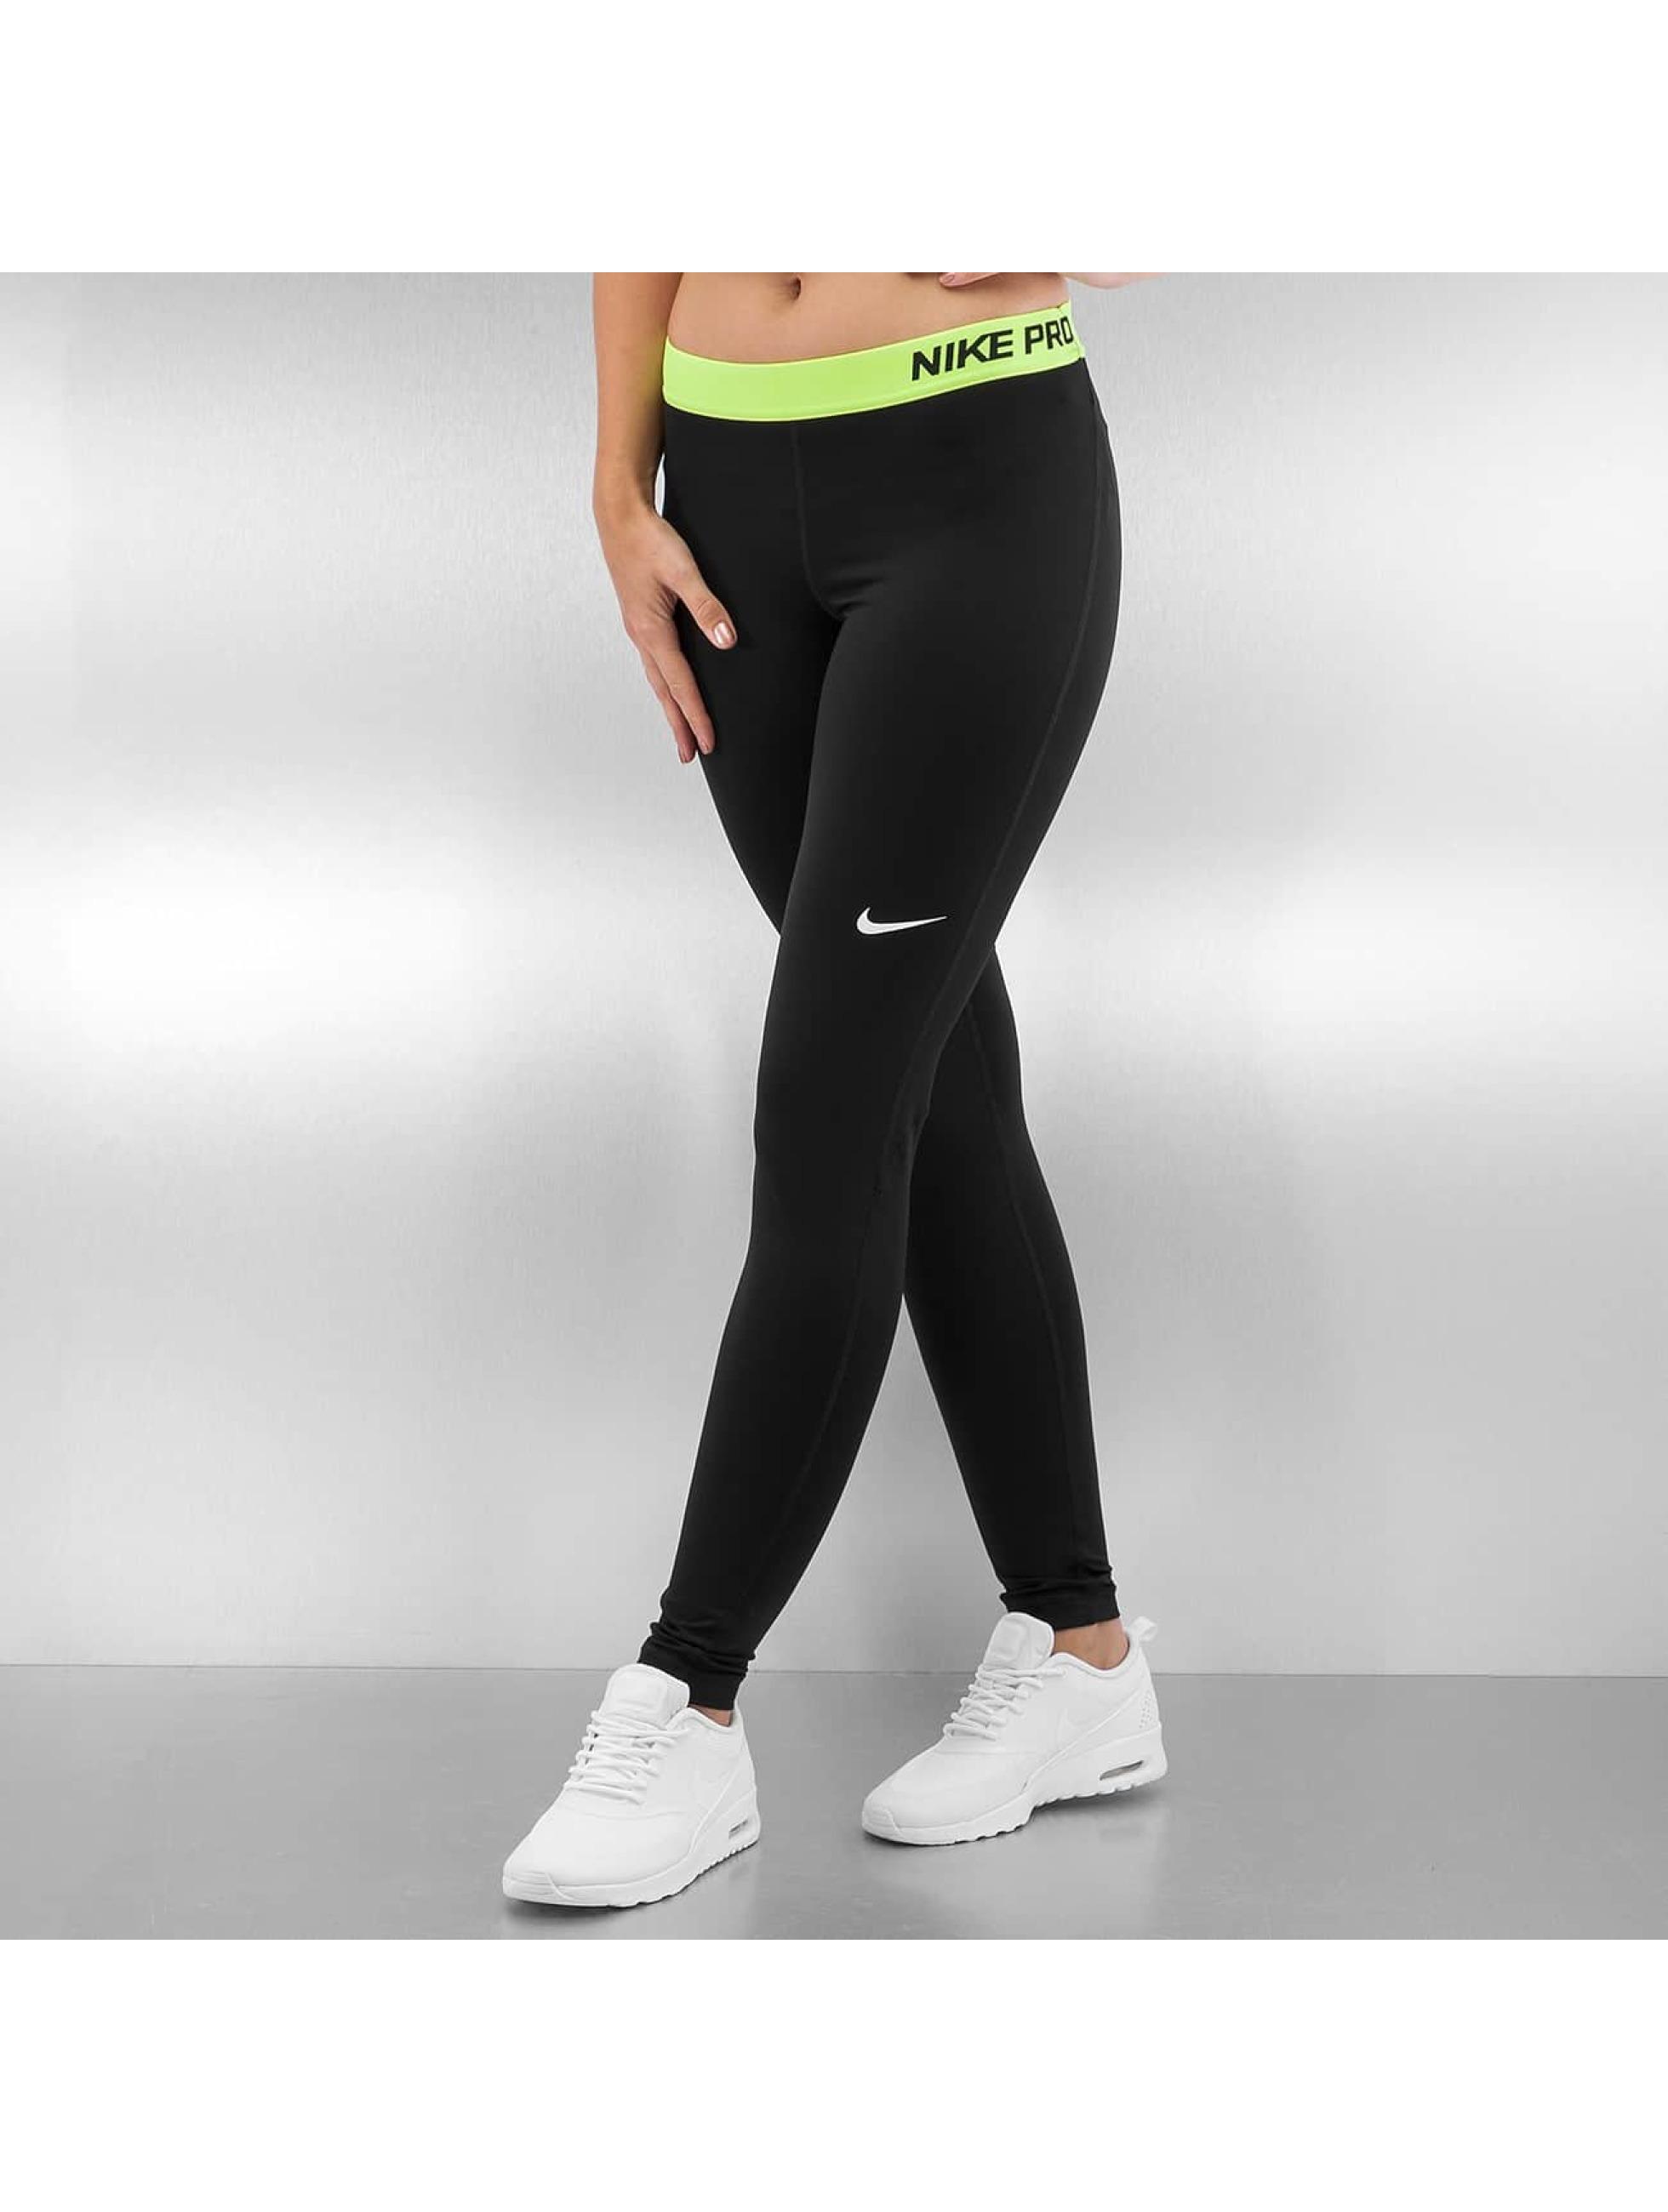 Legging Pro in schwarz